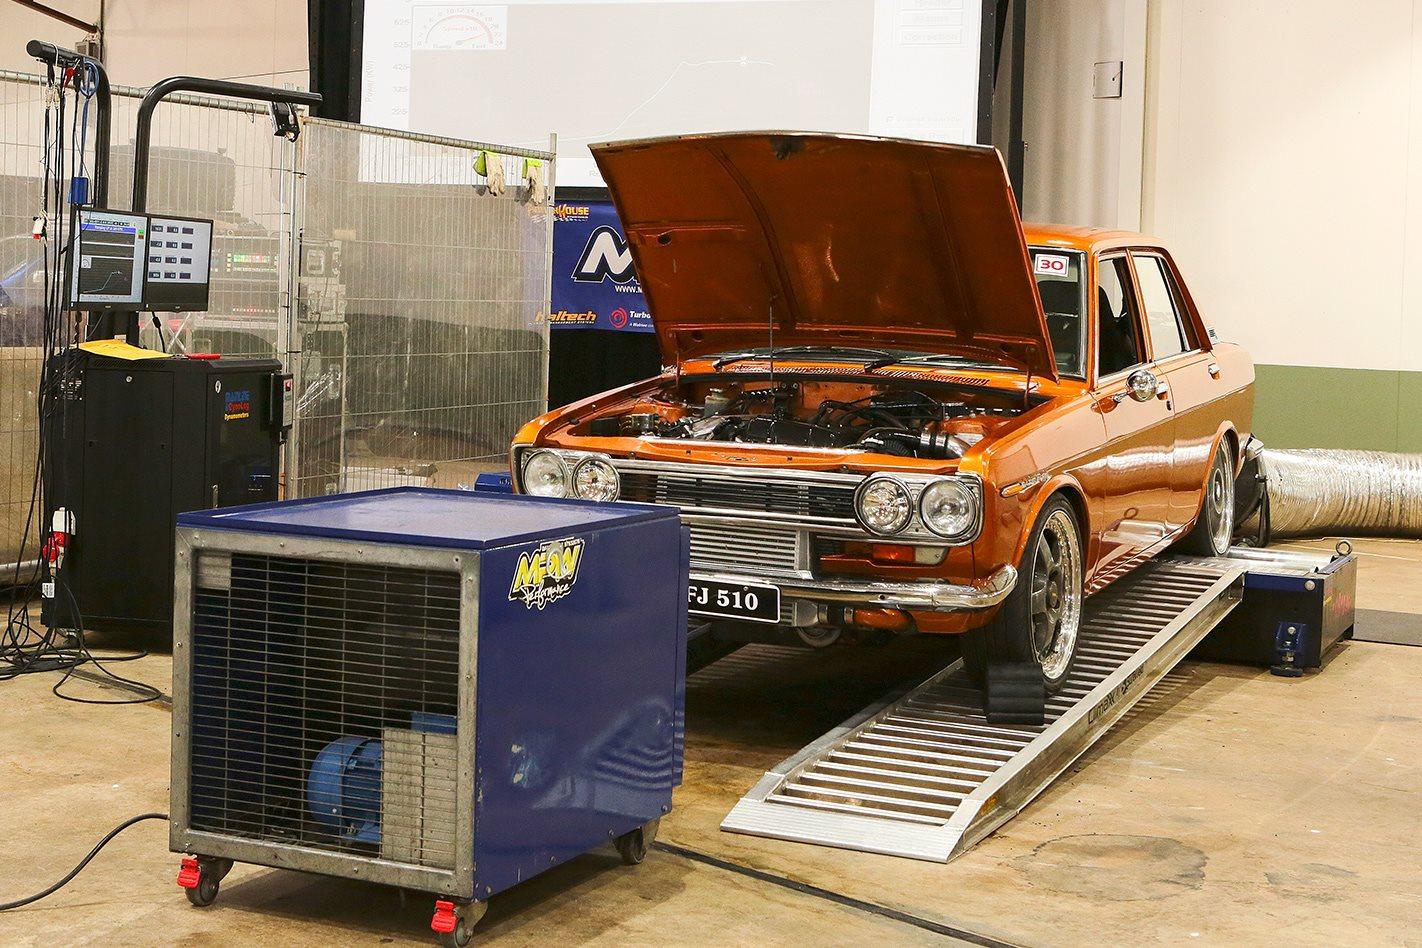 Datsun 1600 on dyno